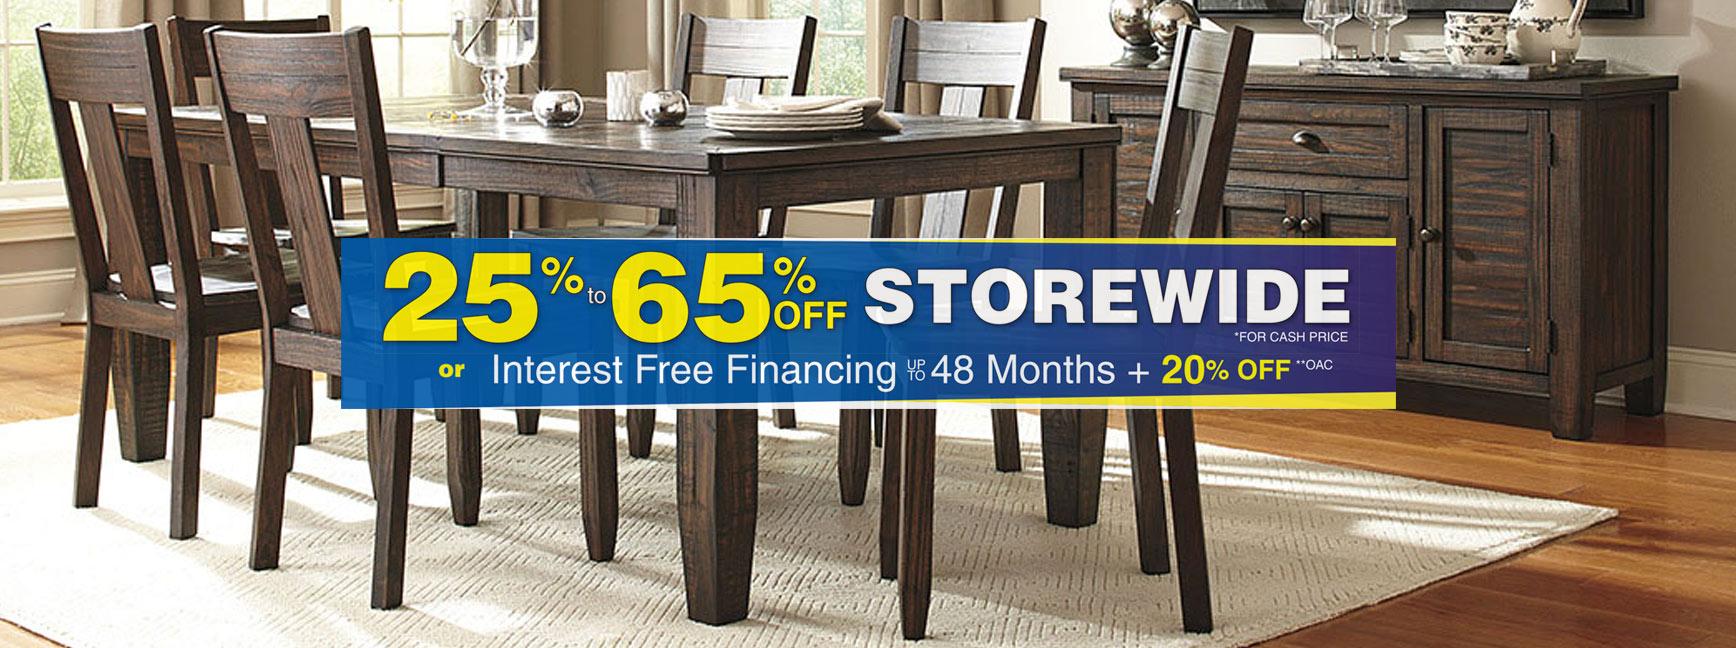 Home furniture stores in sacramento american furniture for Furniture stores sacramento